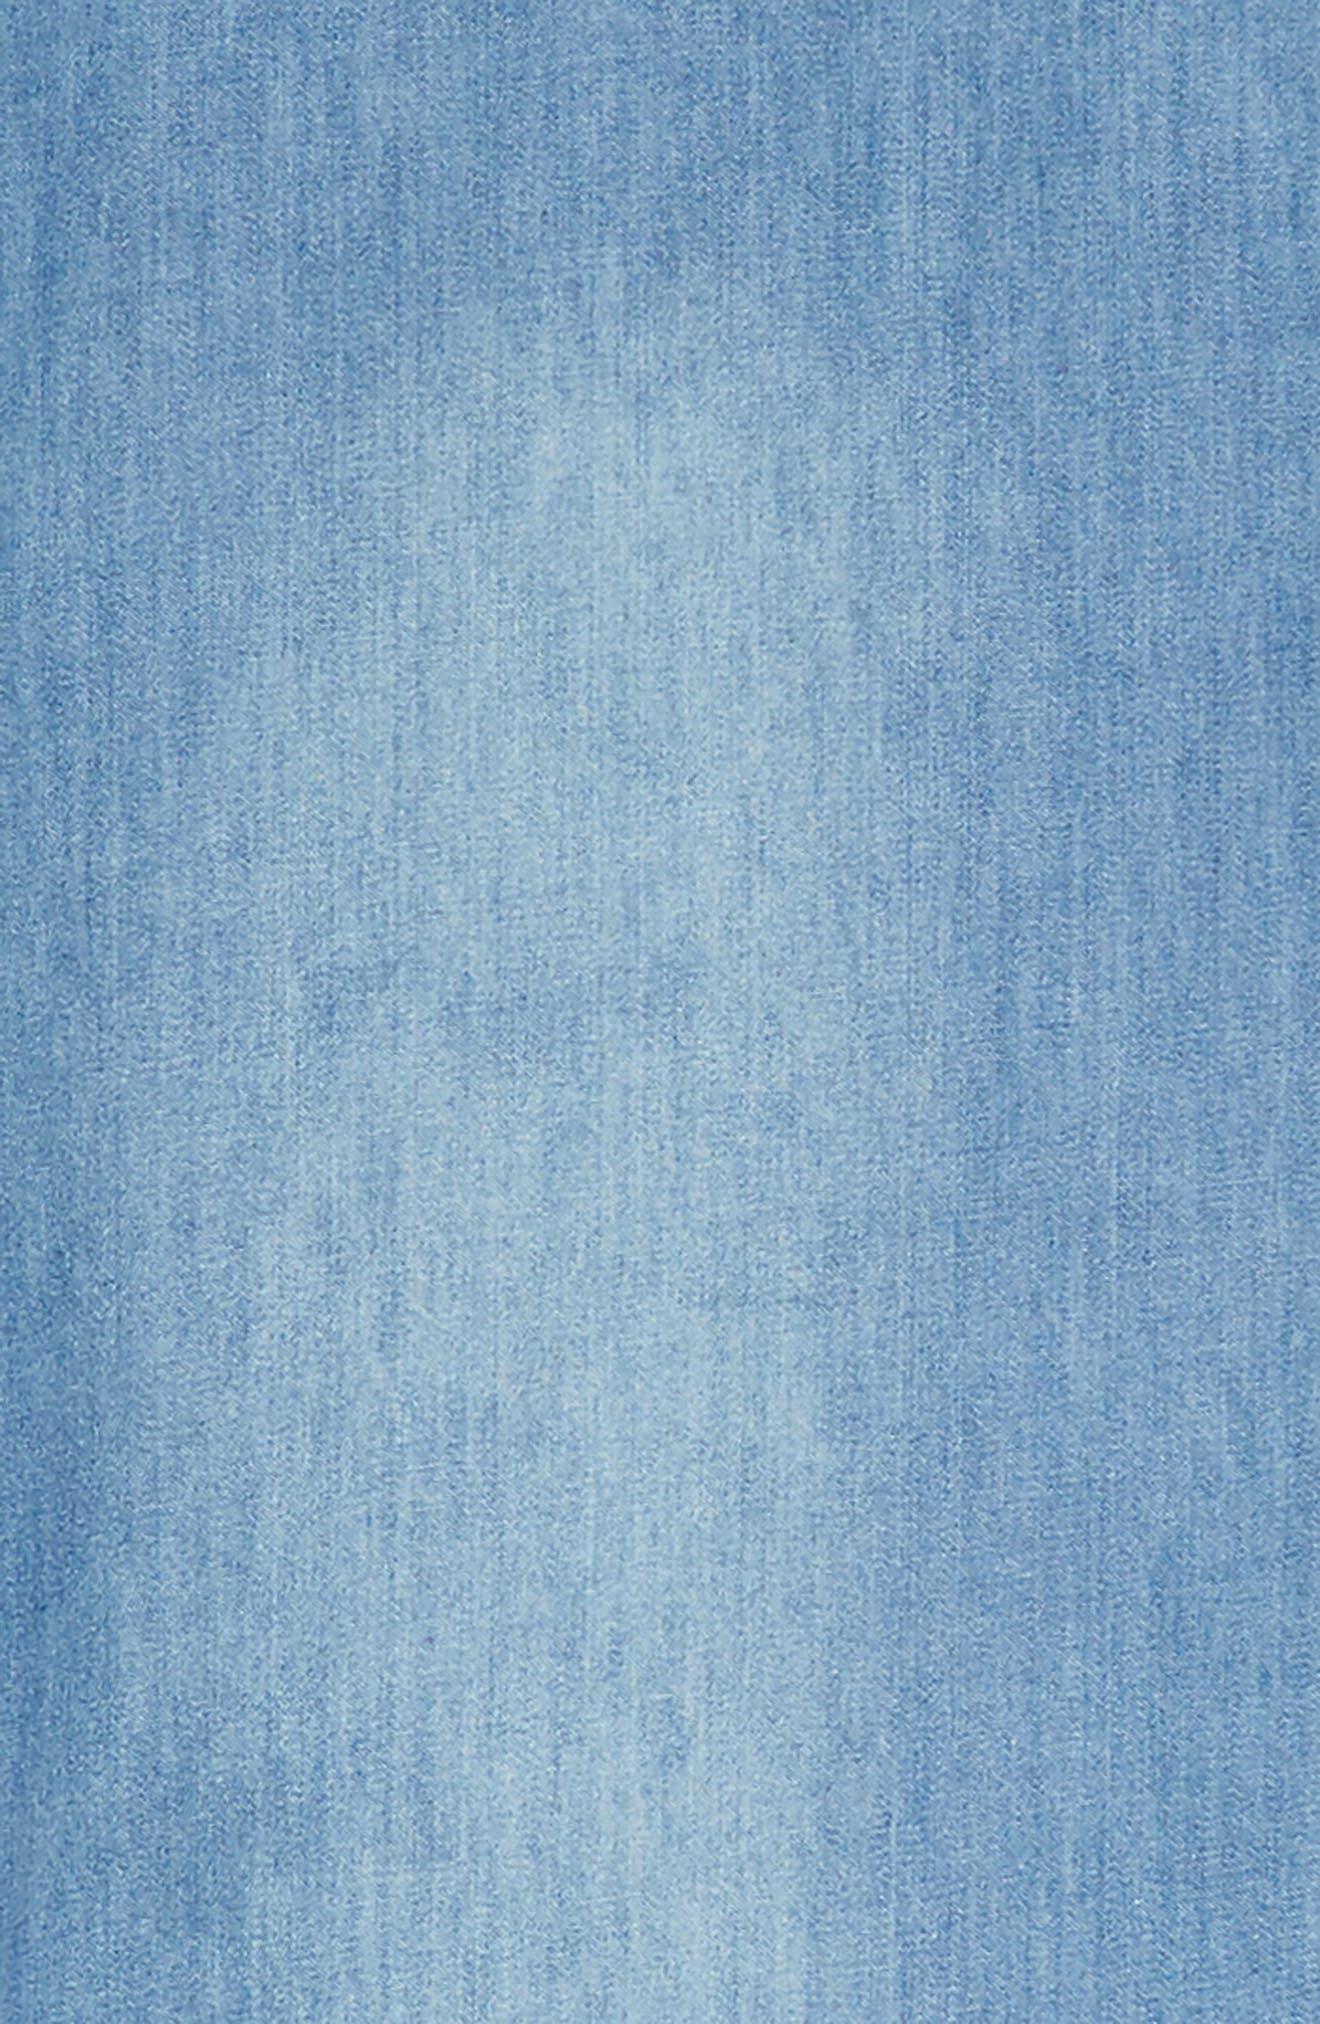 Lulu Lace-Up Chambray Dress,                             Alternate thumbnail 3, color,                             Light Blue